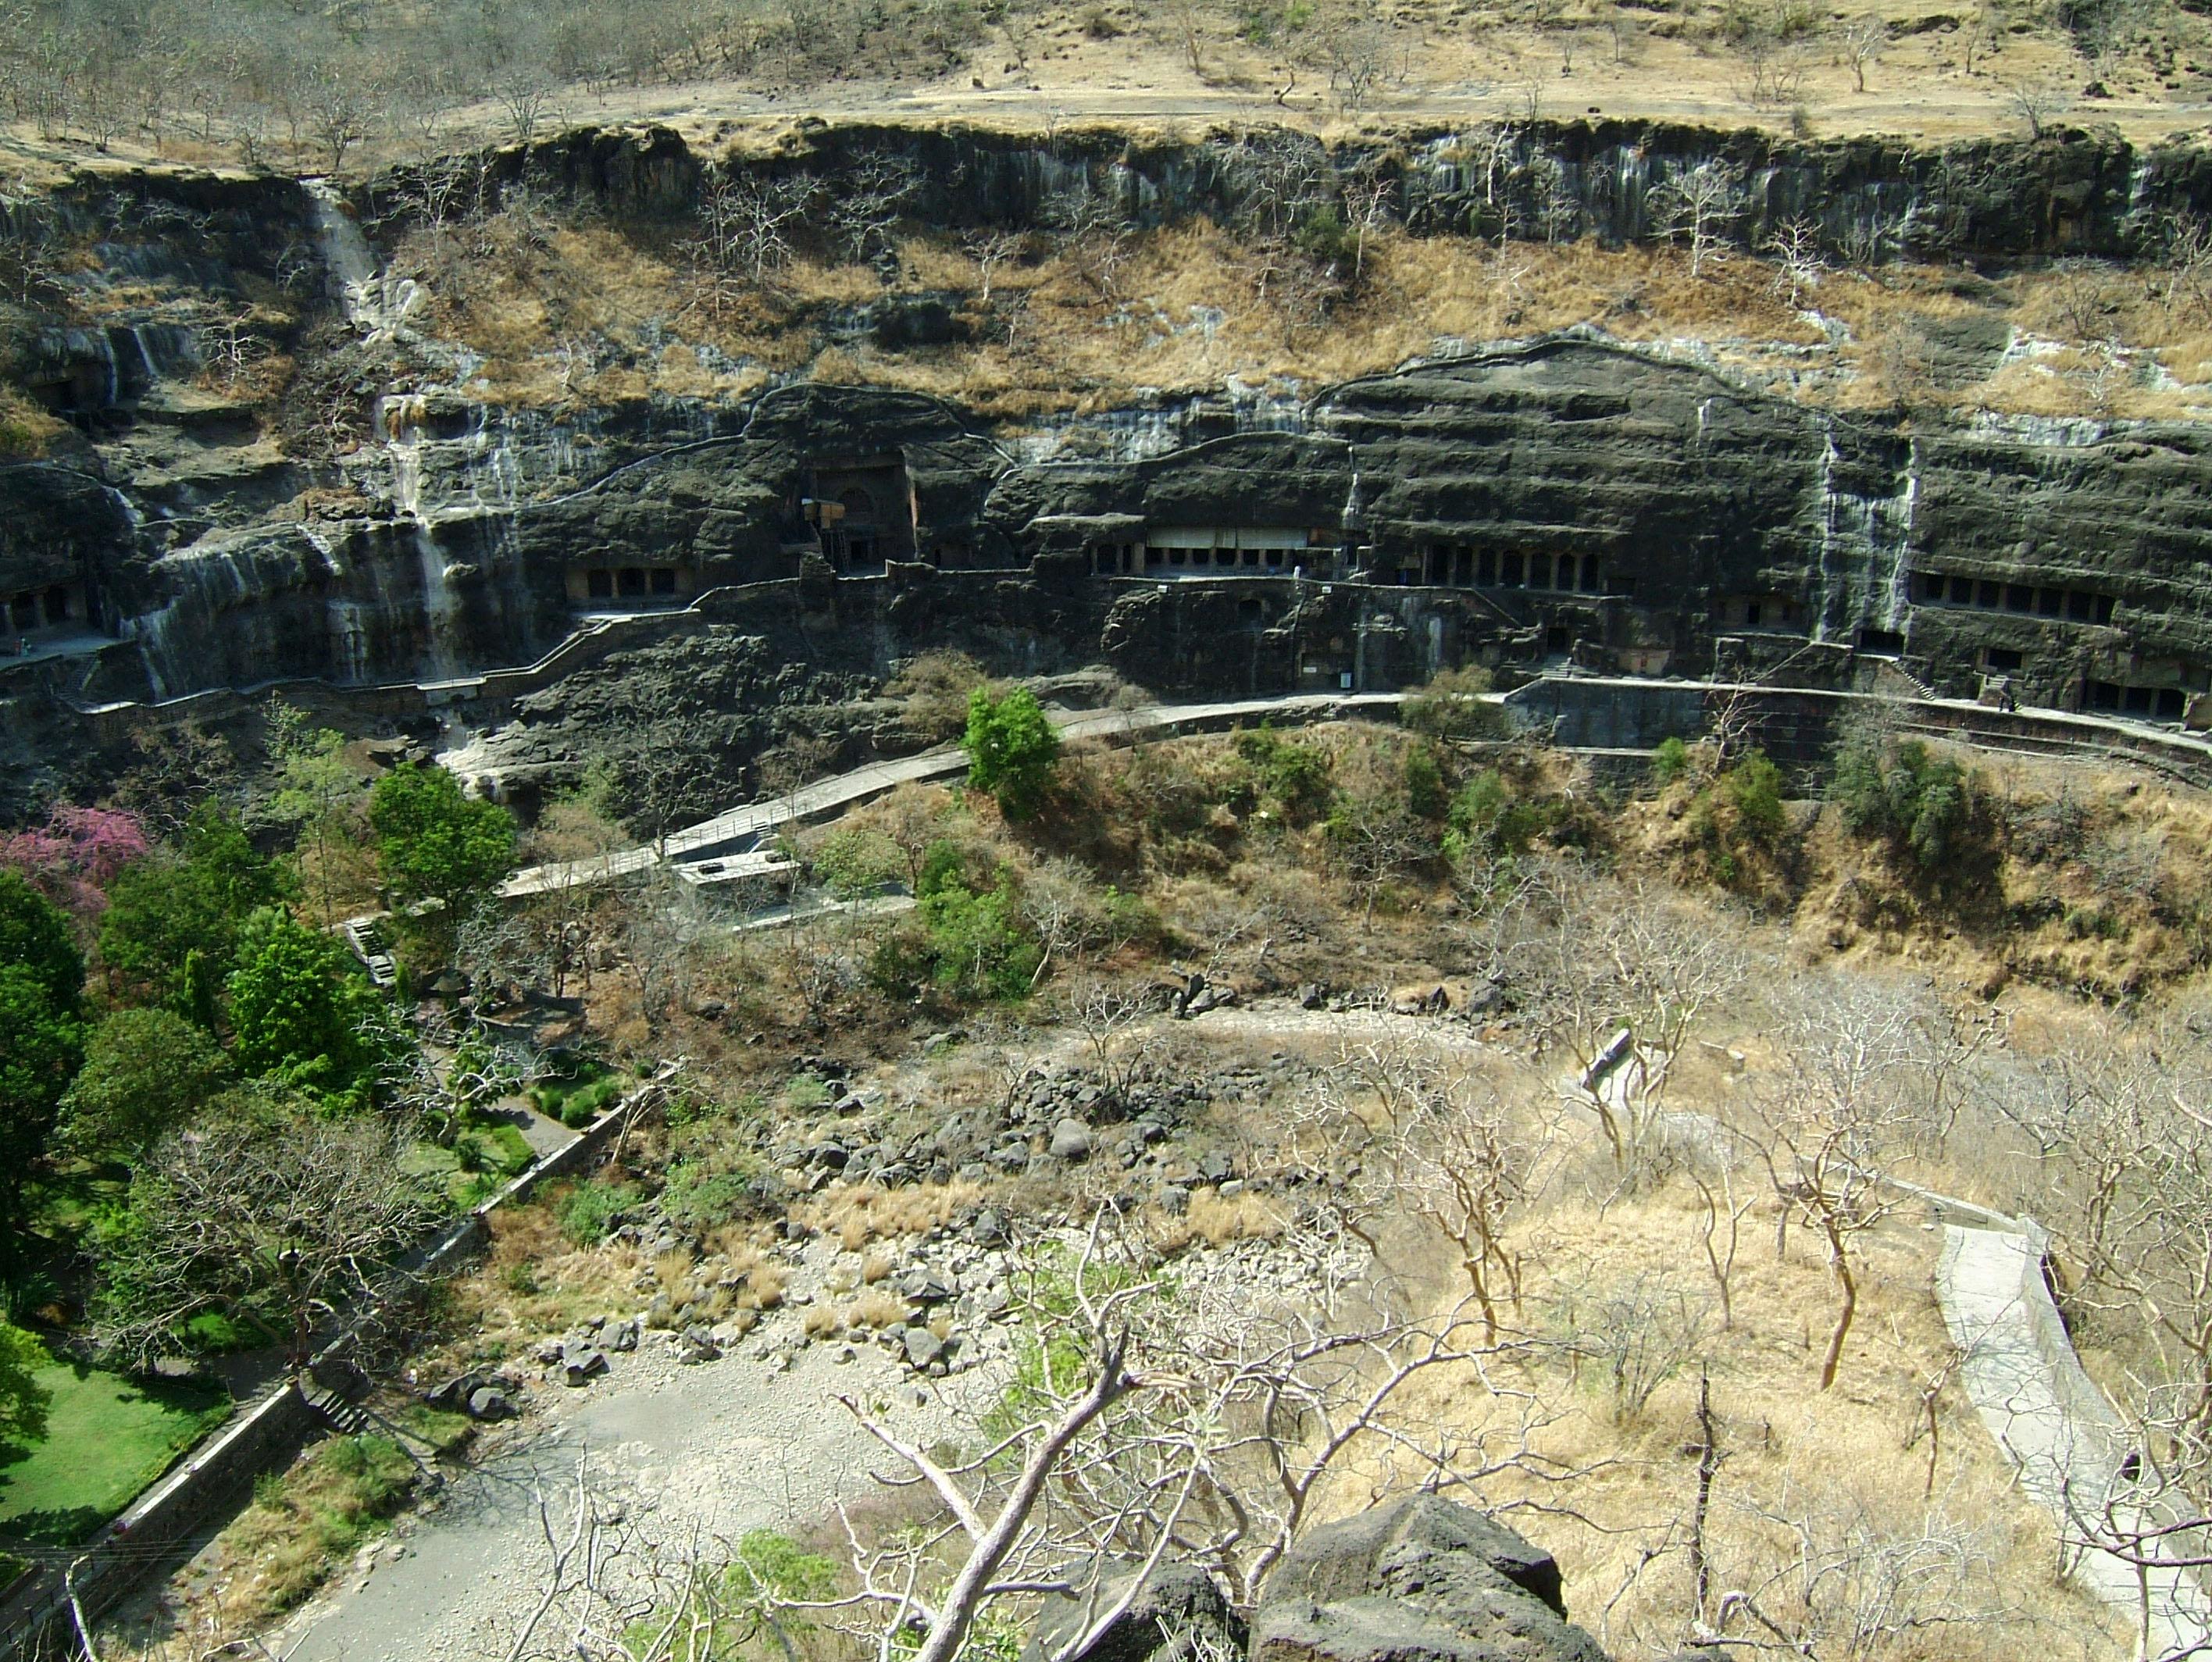 Marathwada Ajanta Caves entrance India Apr 2004 06